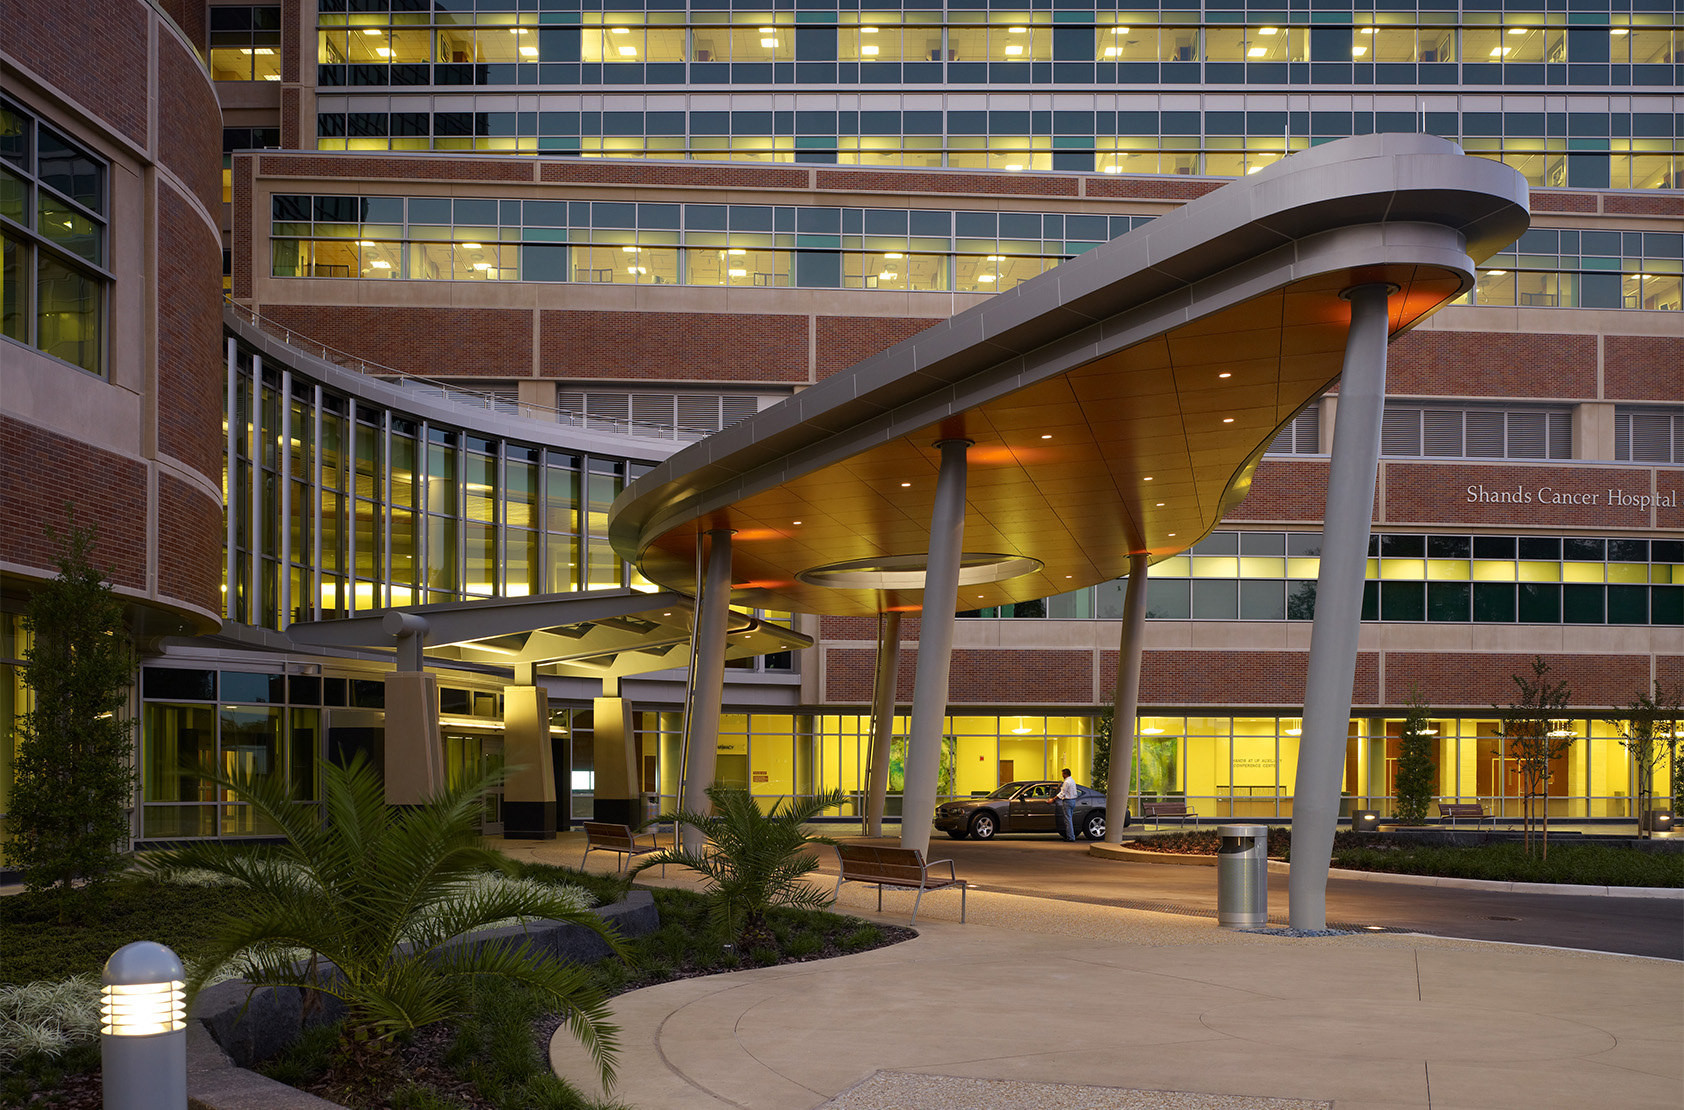 UF Health - Cancer Hospital